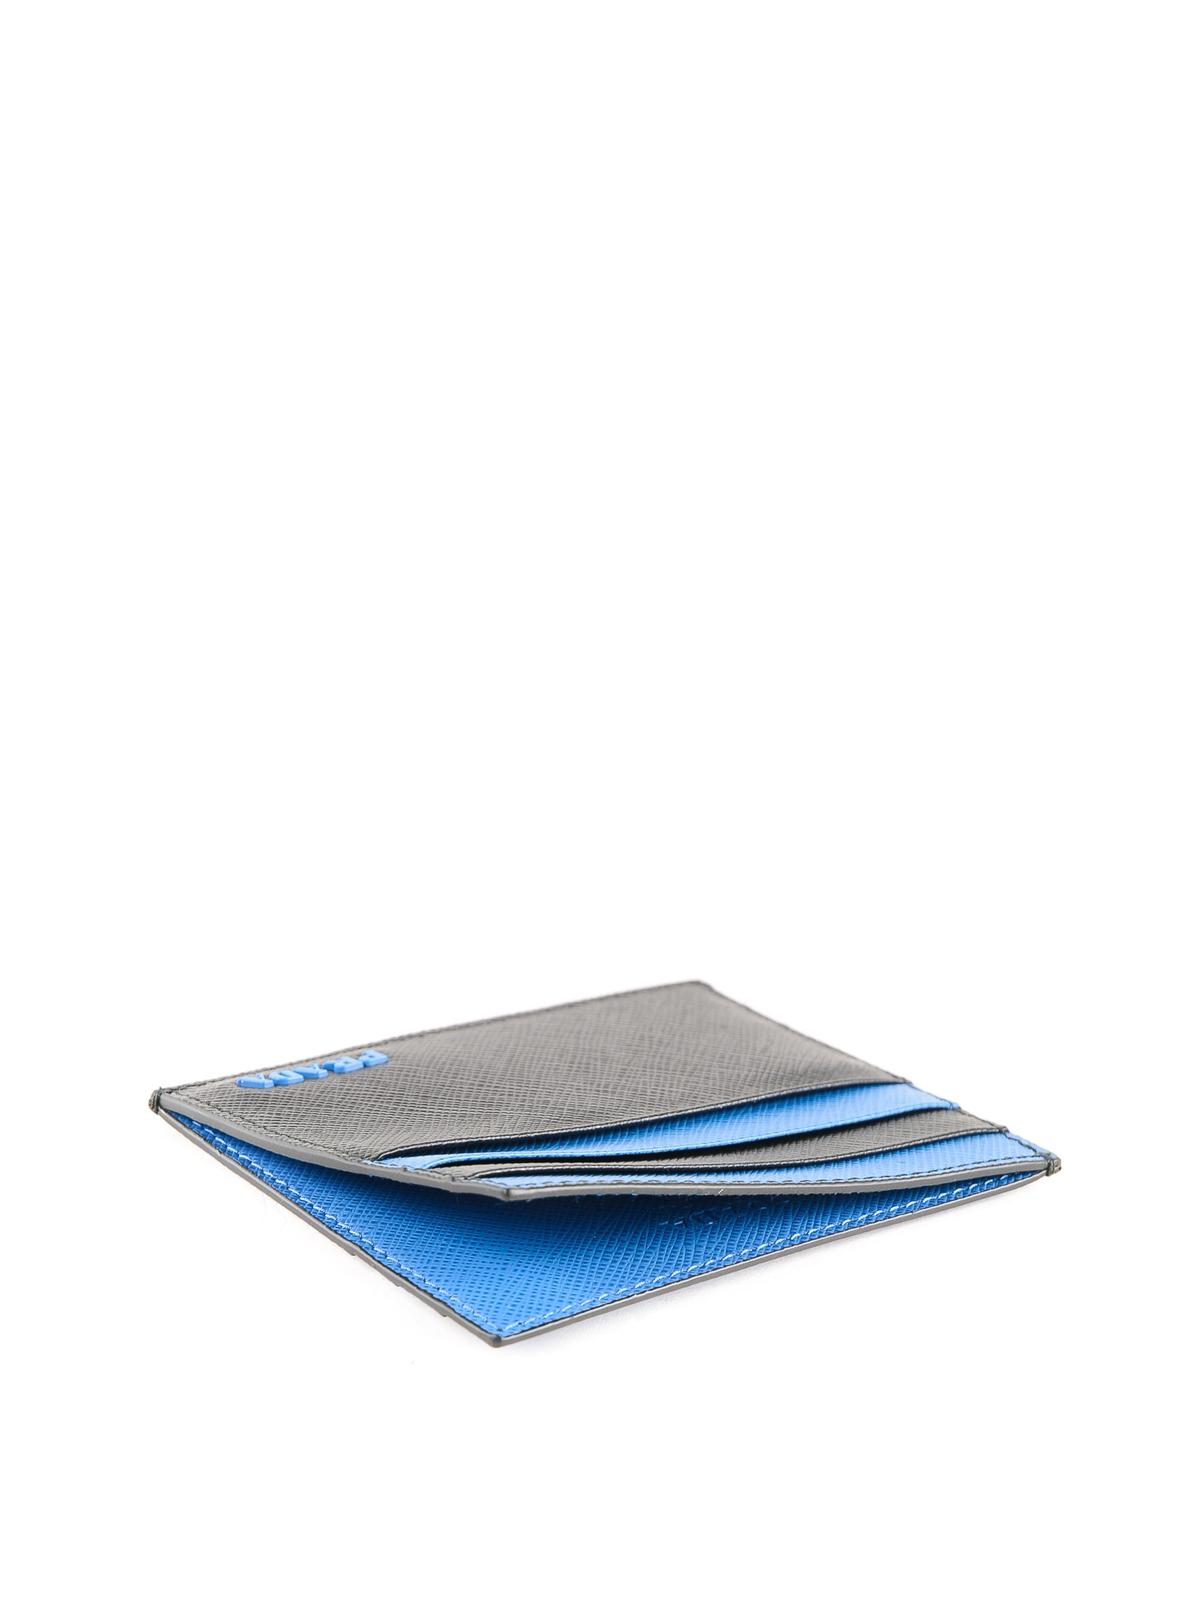 0f7013e0cebc PRADA buy online Black and blue Saffiano leather card holder. PRADA: wallets  & purses ...